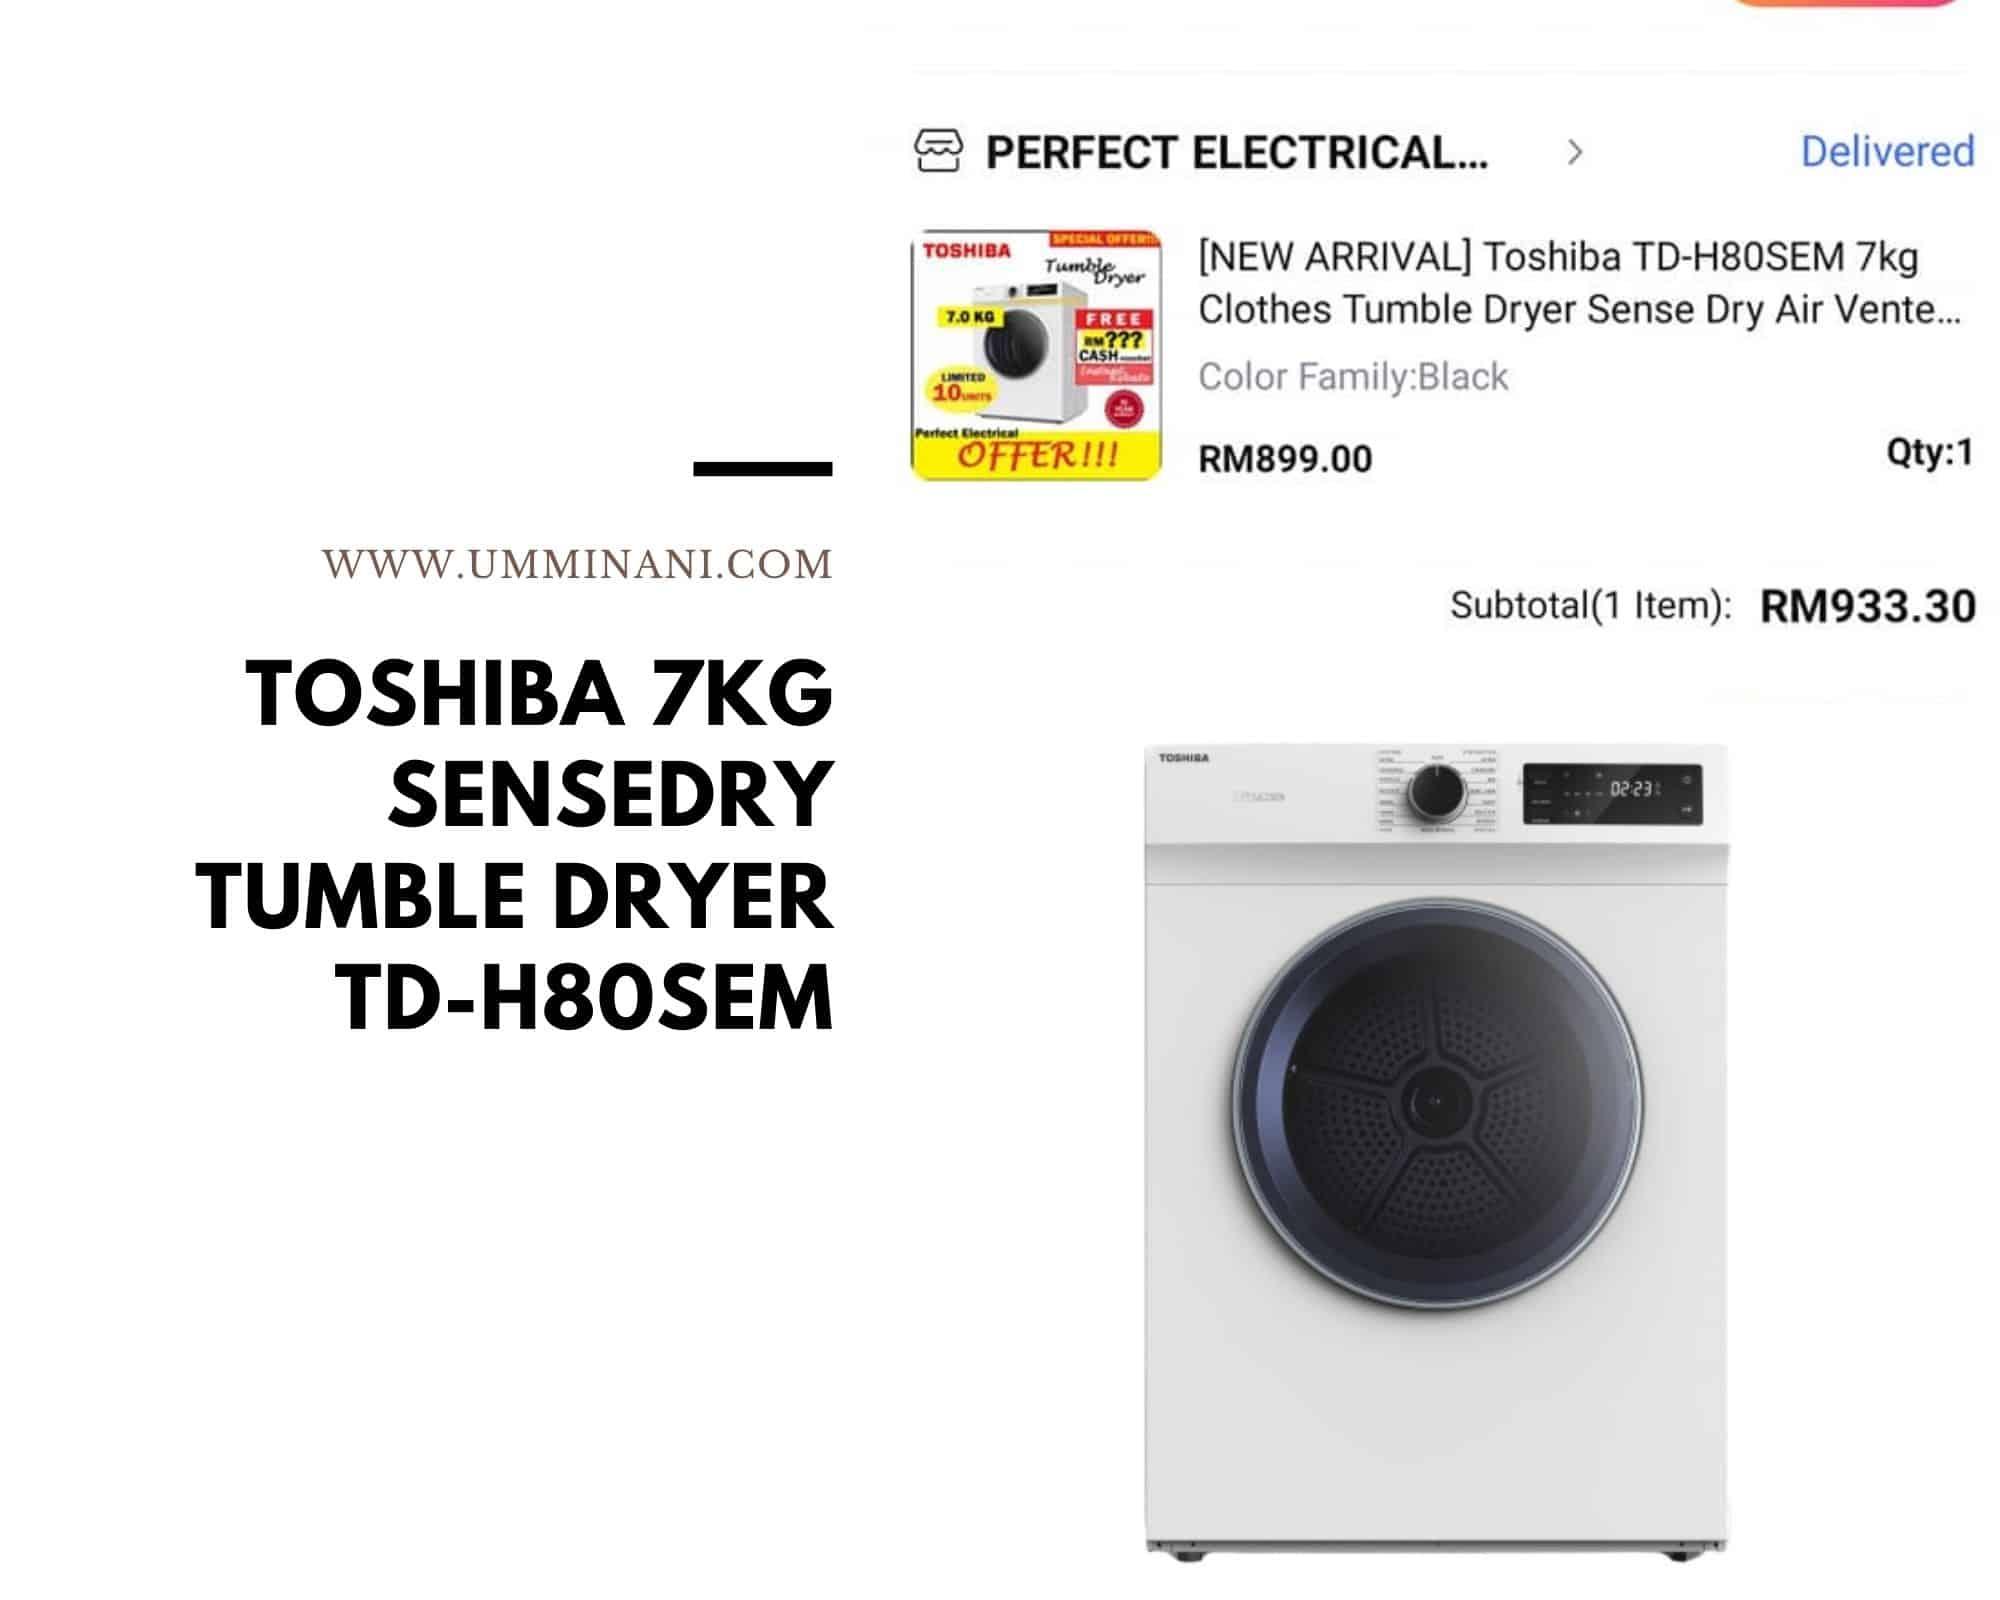 Toshiba 7KG Sensedry Tumble Dryer TD-H80SEM